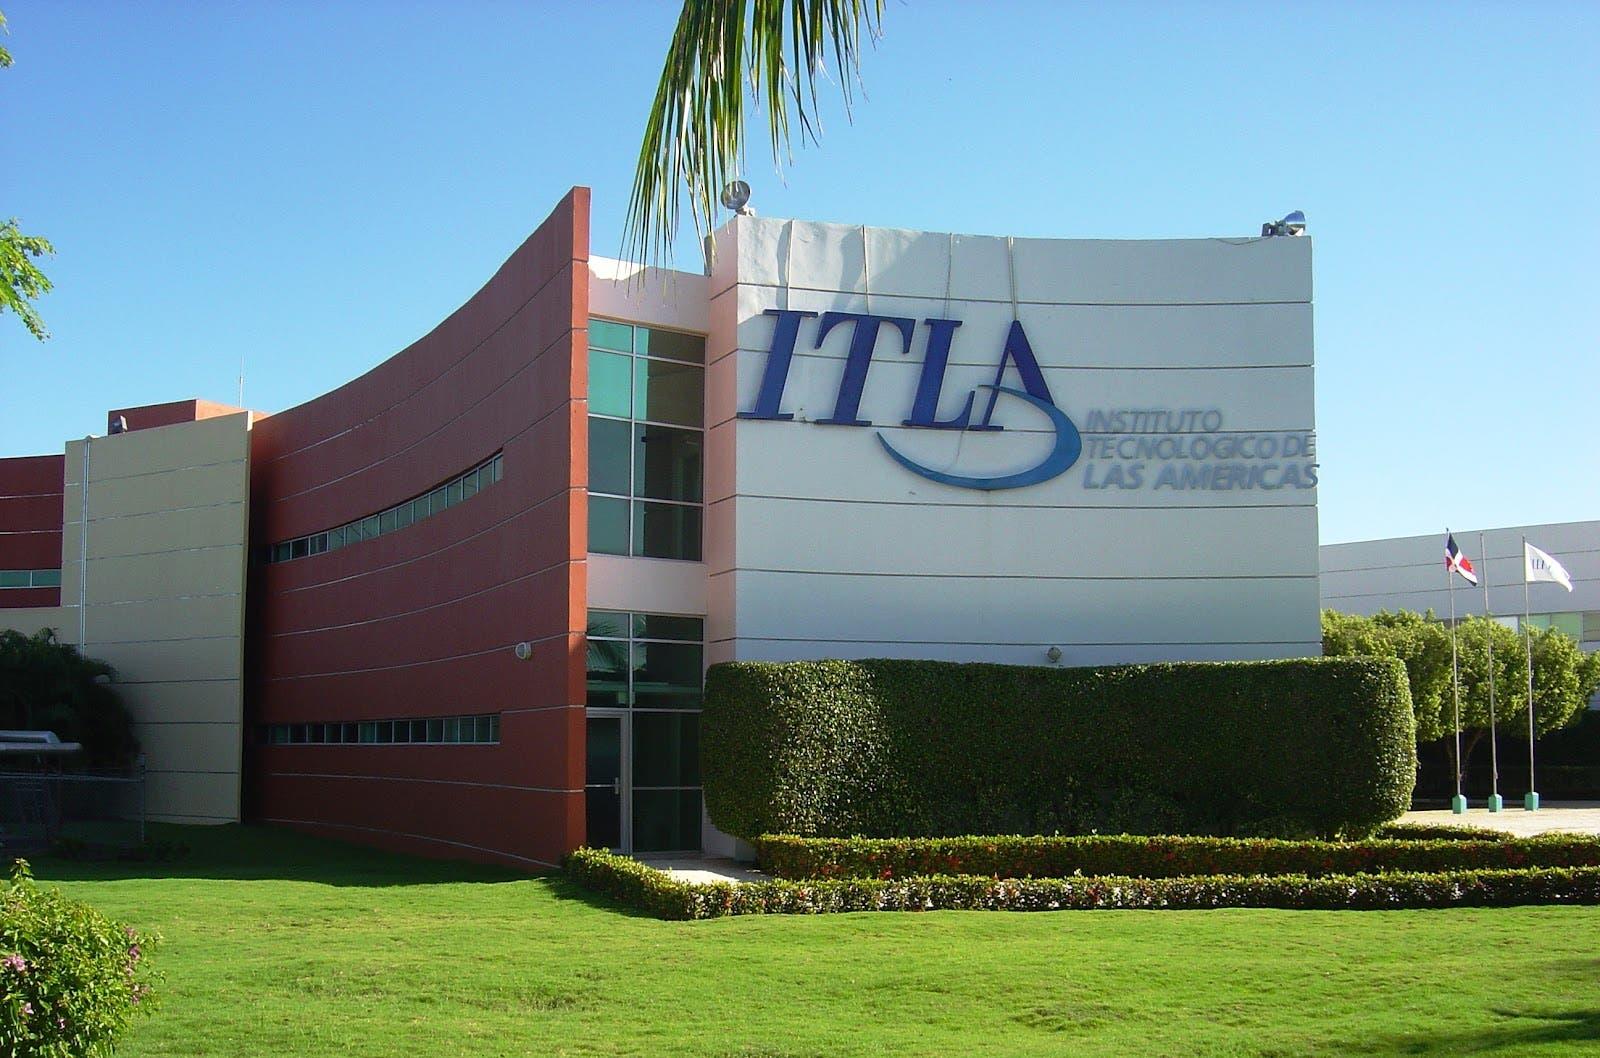 ITLA abrirá en SDE dos centros de capacitación